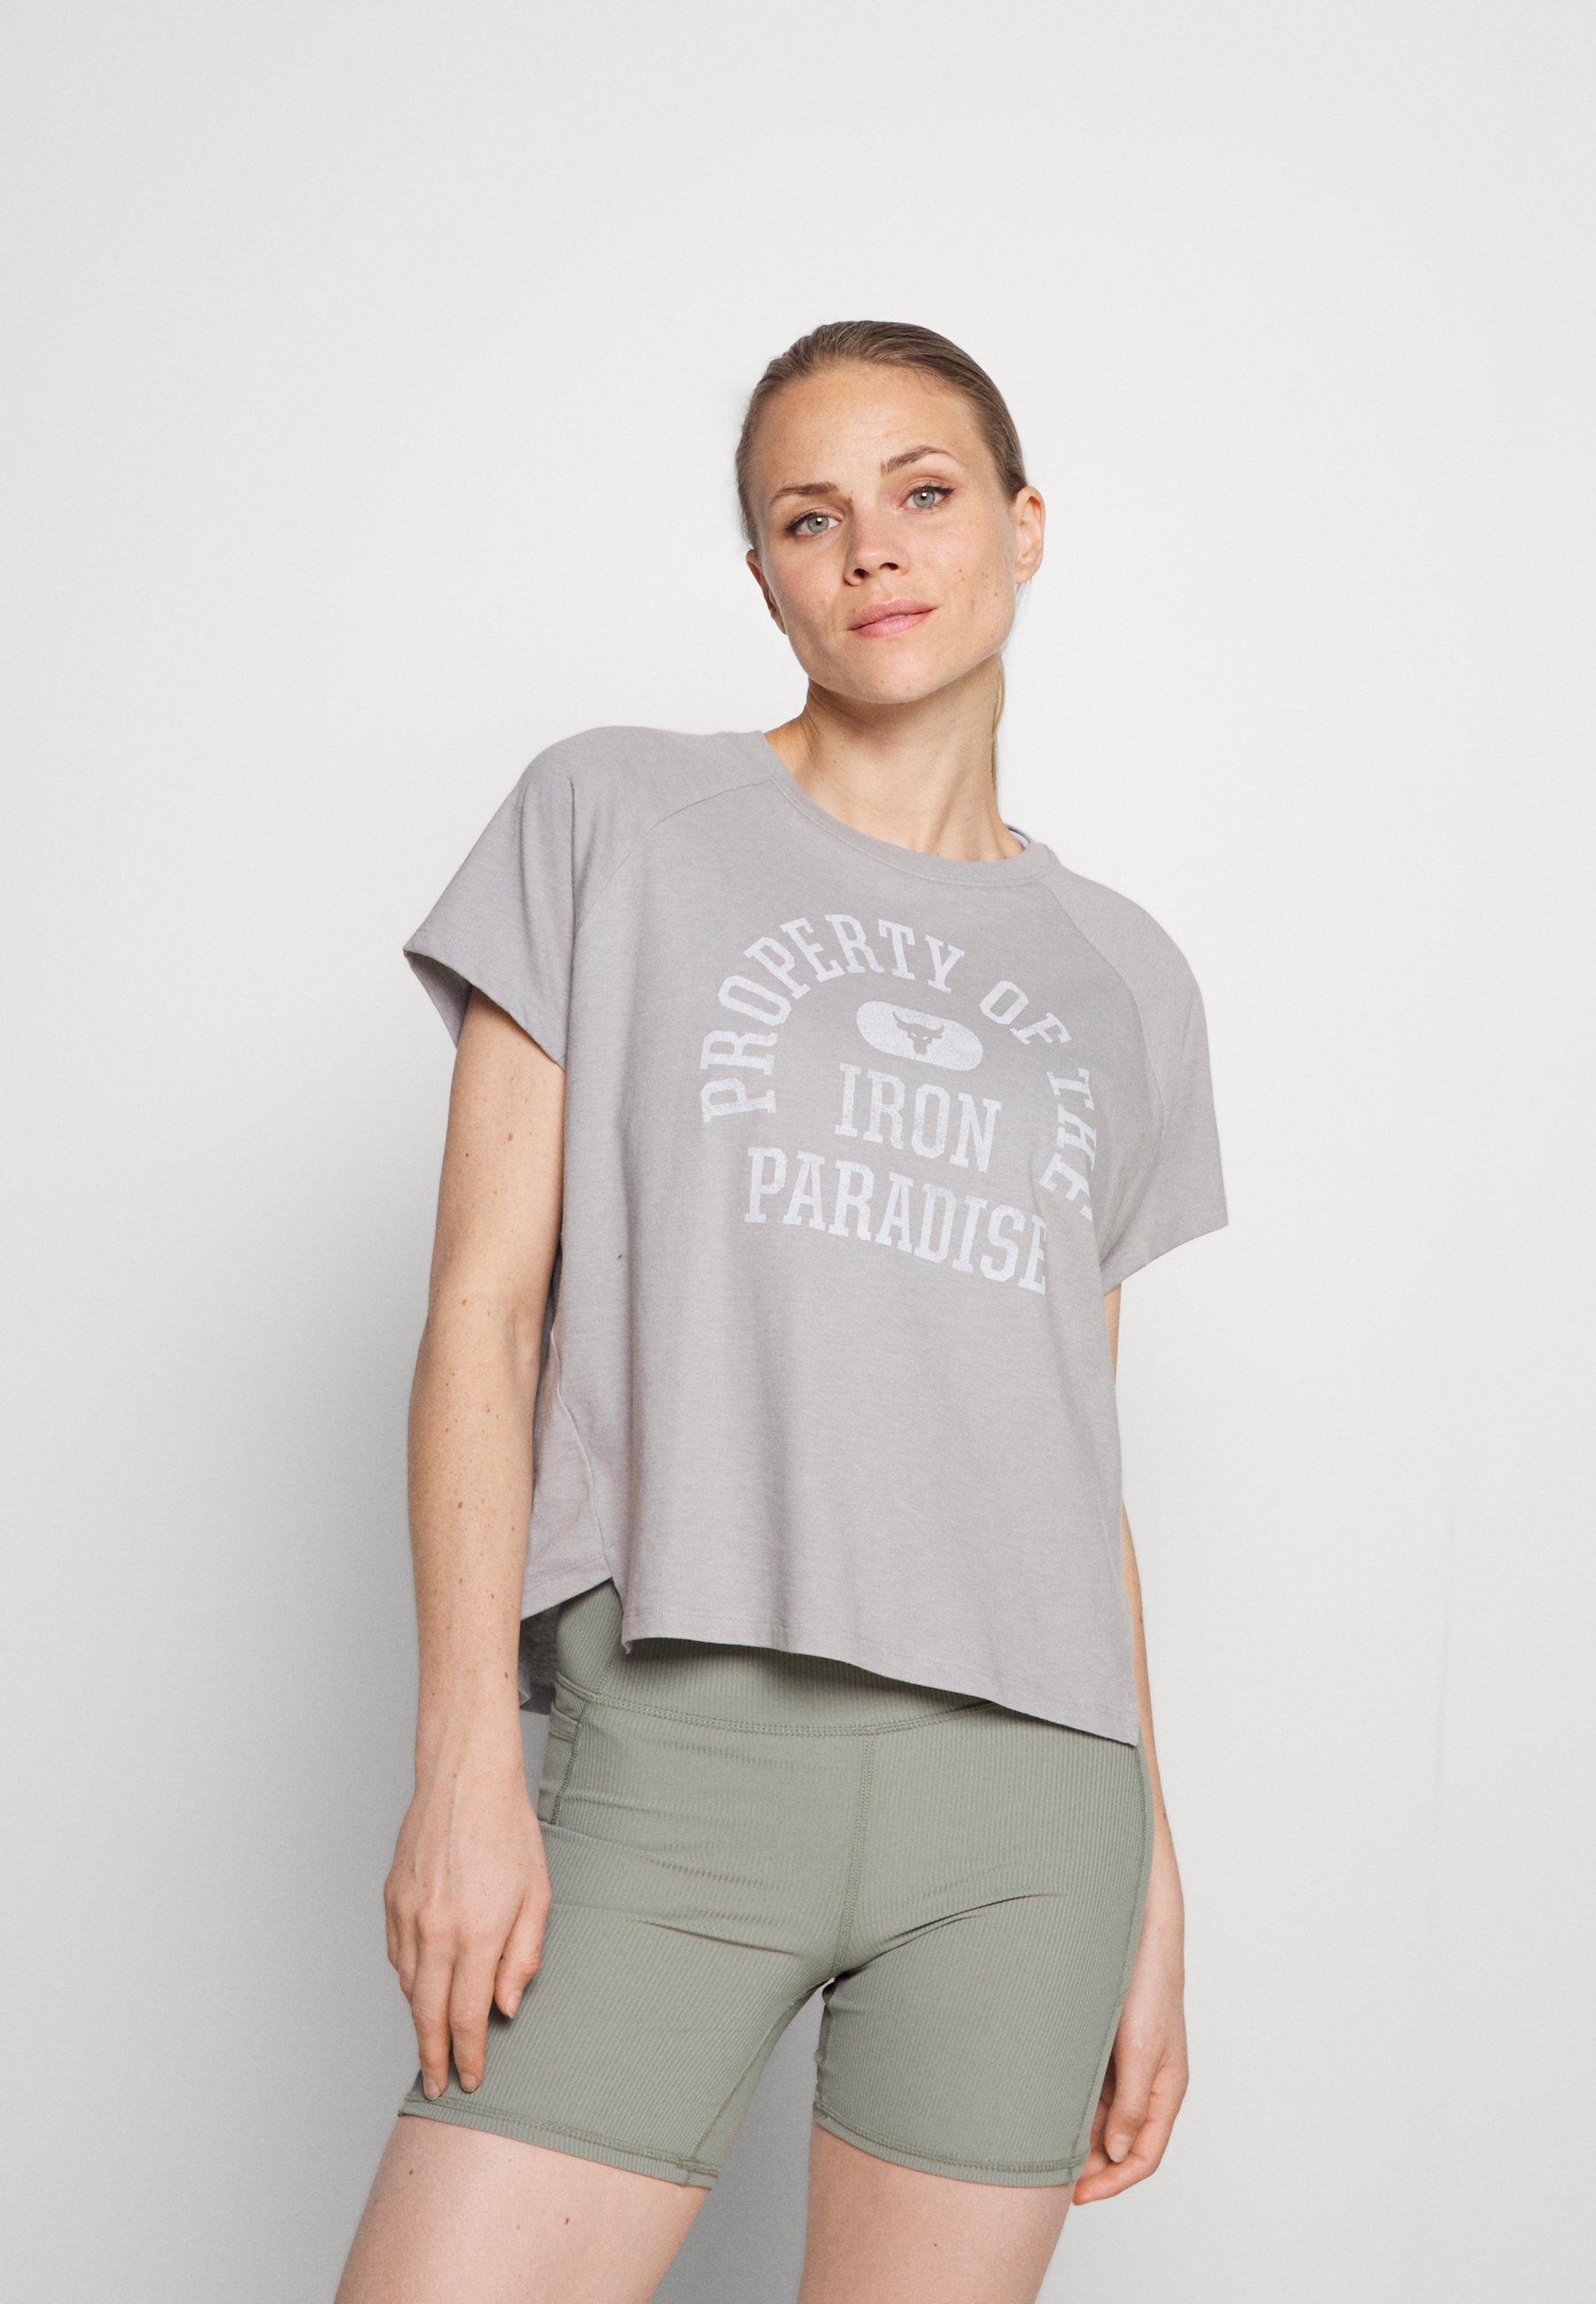 Women ROCK PROPERTY OF - Print T-shirt